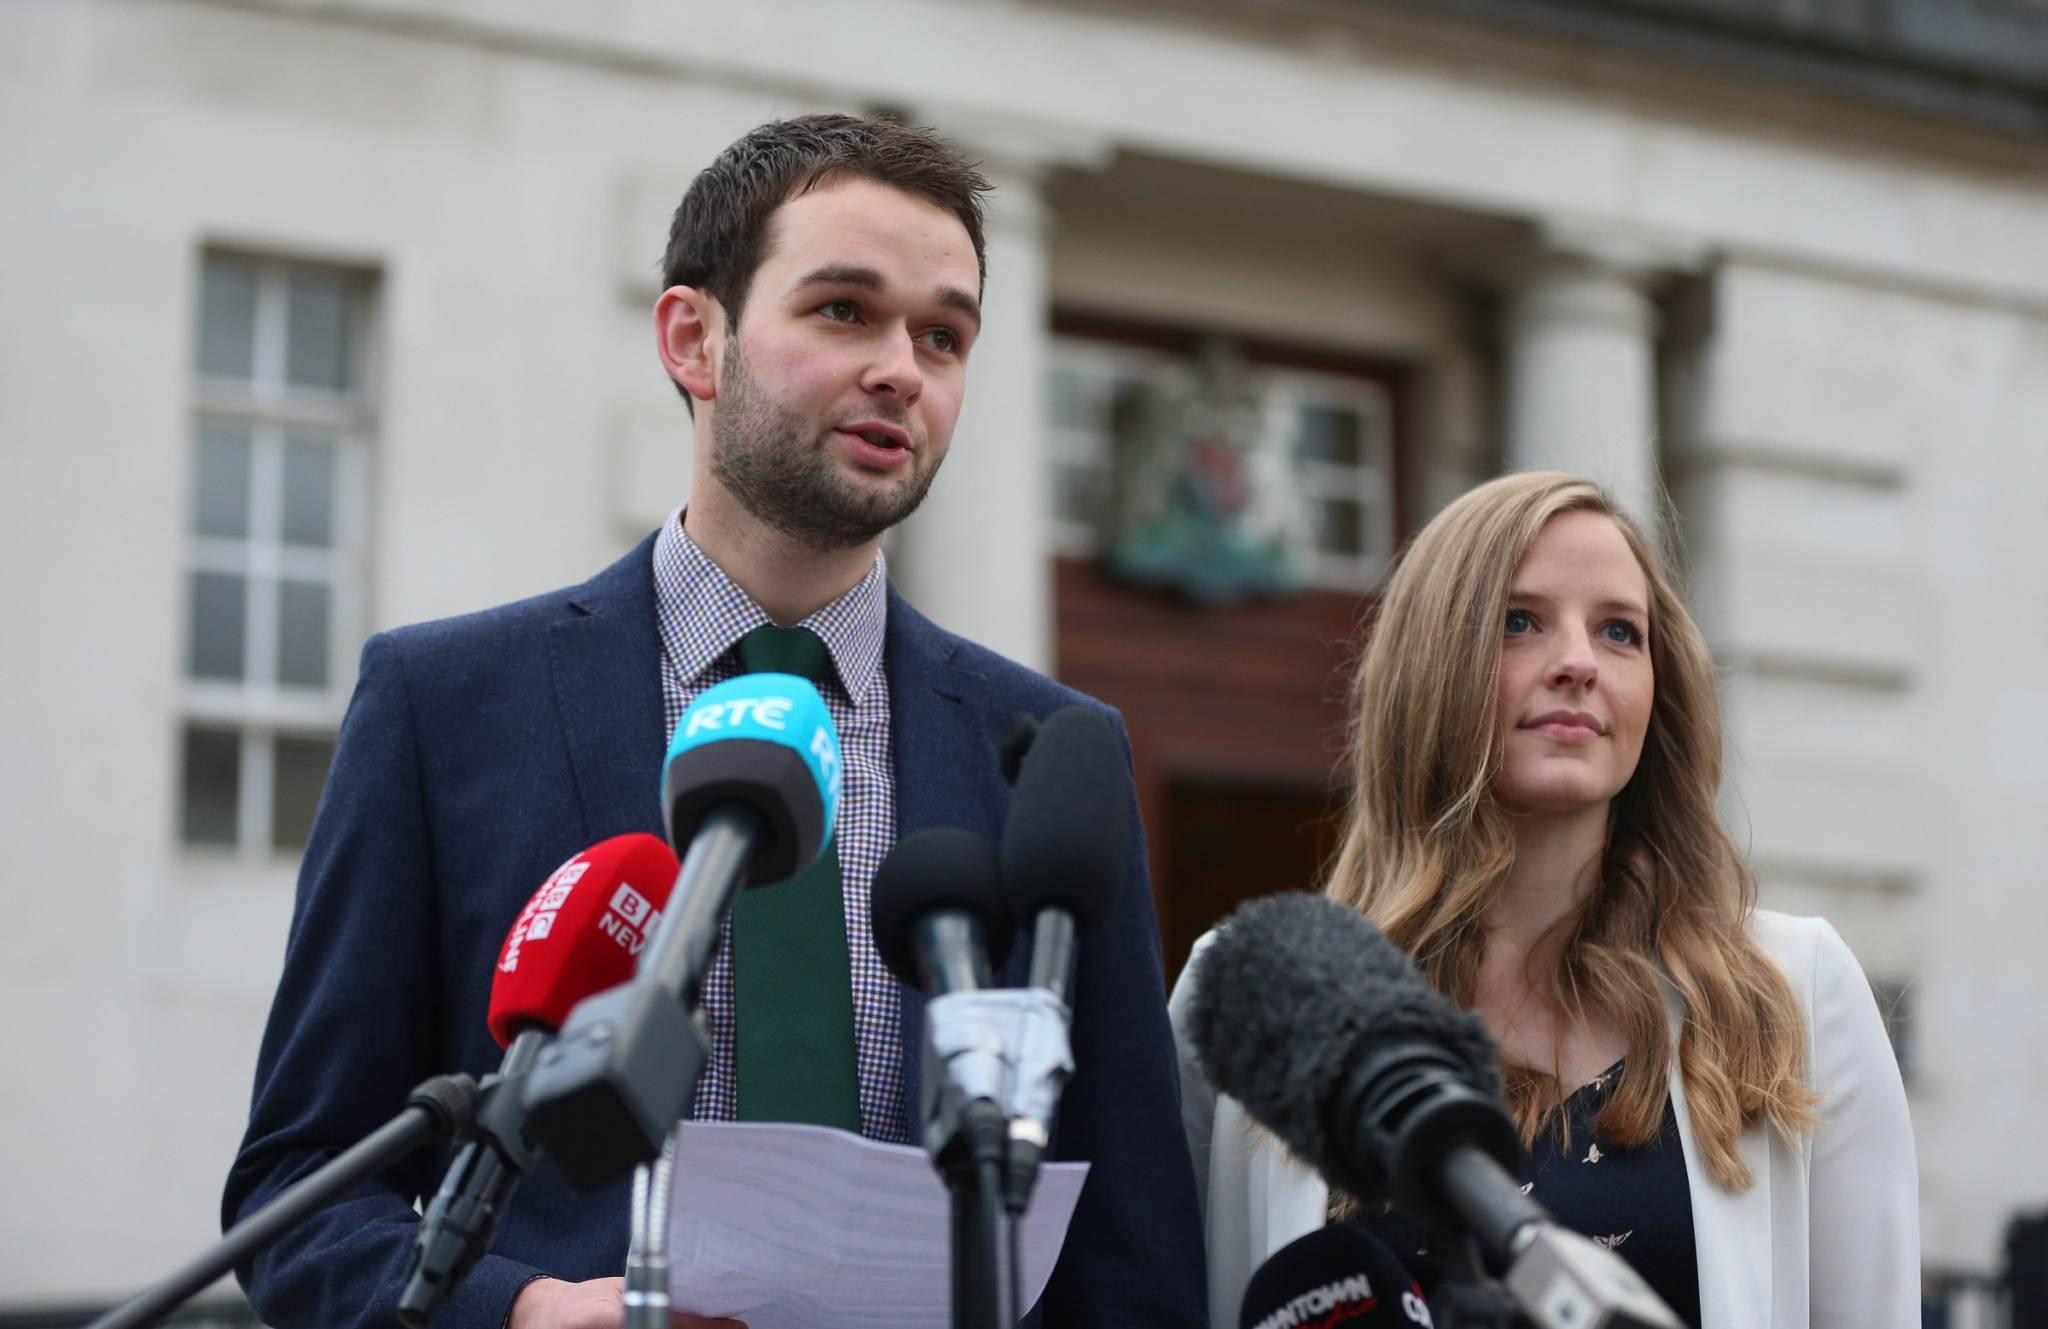 Asheri omanikud Daniel ja Amy McArthur kohtuotsuse eel ajakirjanikele kõnelemas. Foto: Niall Carson, AP/Scanpix